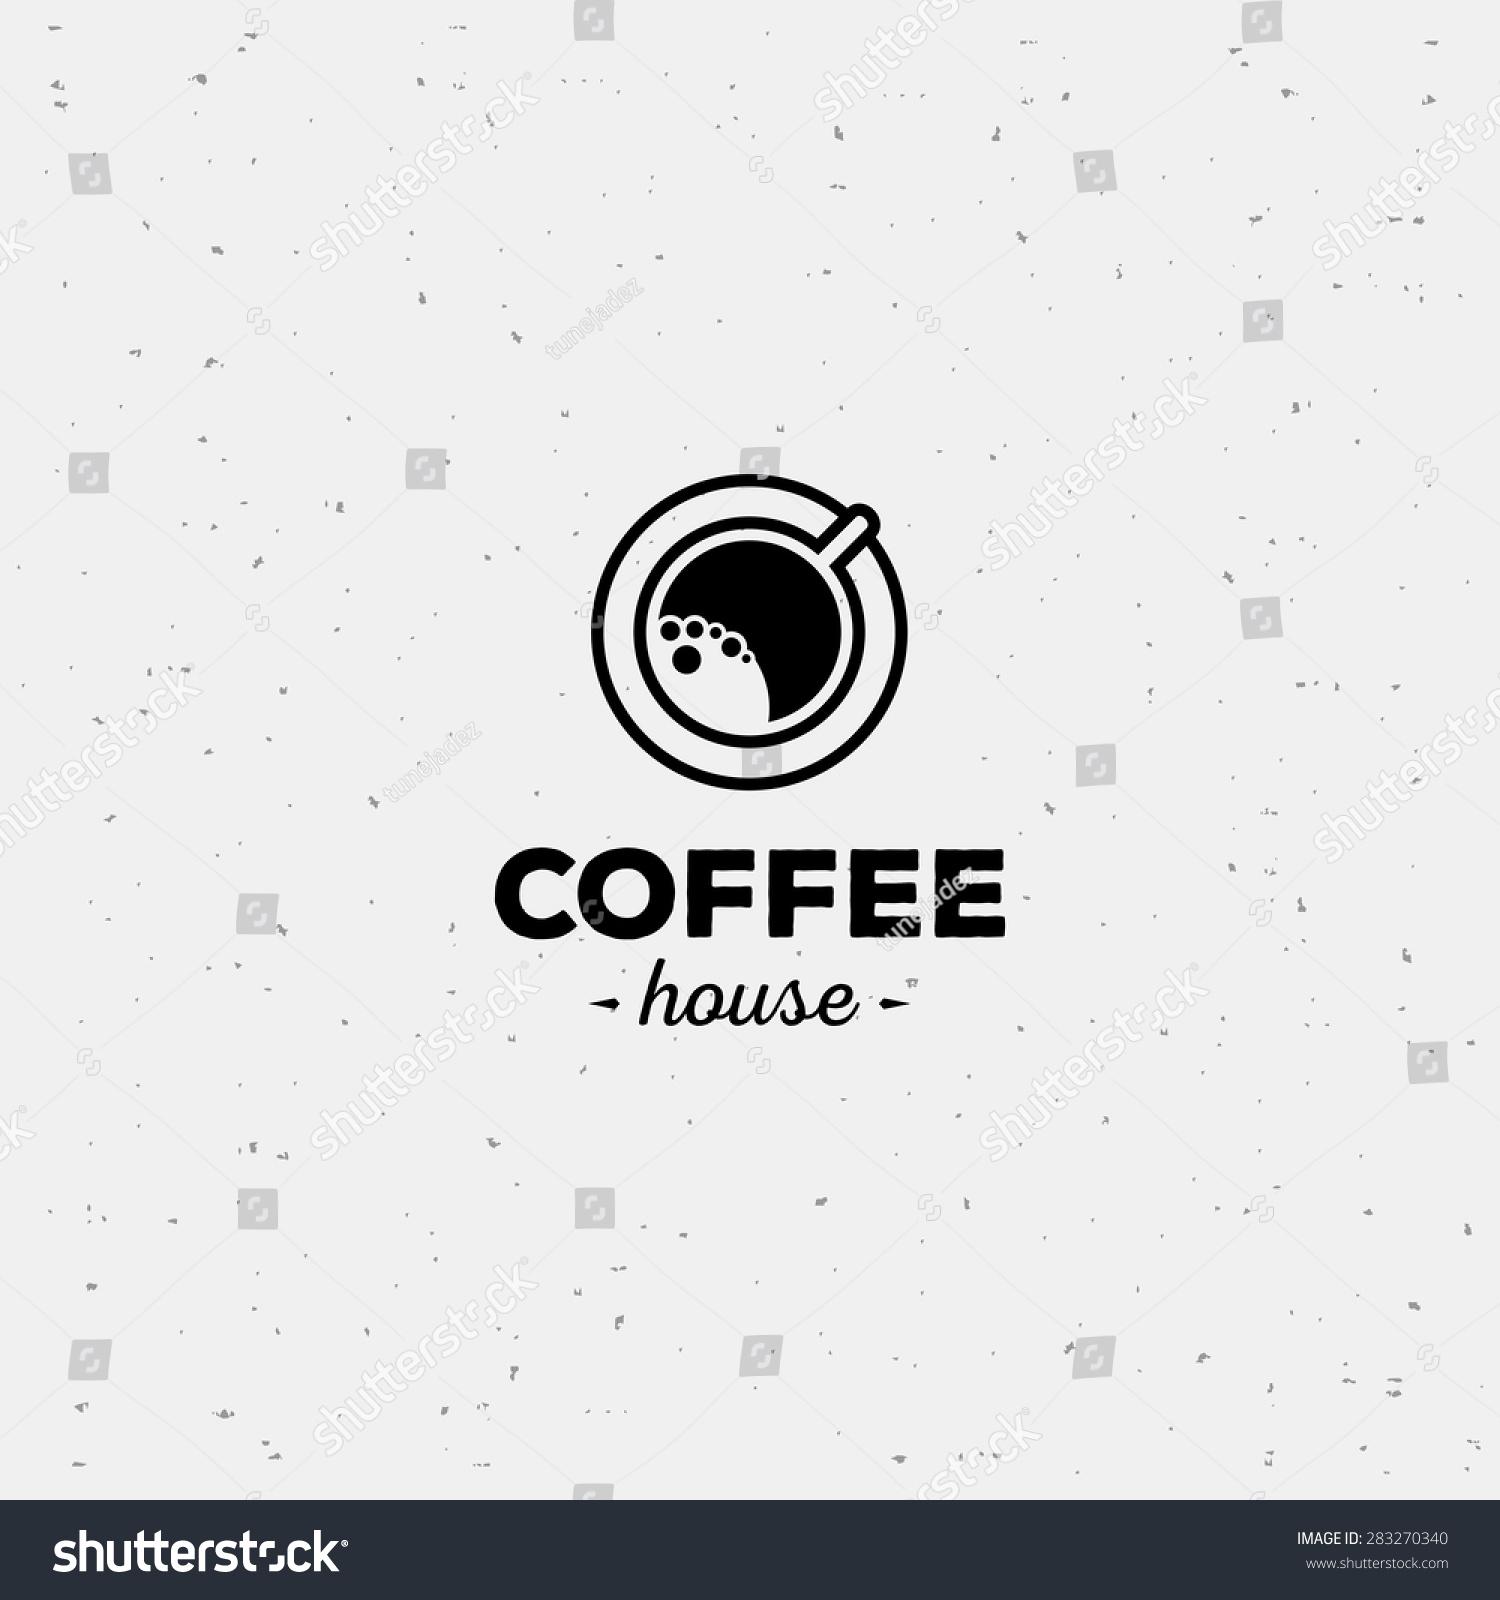 coffee cup logo template - photo #38